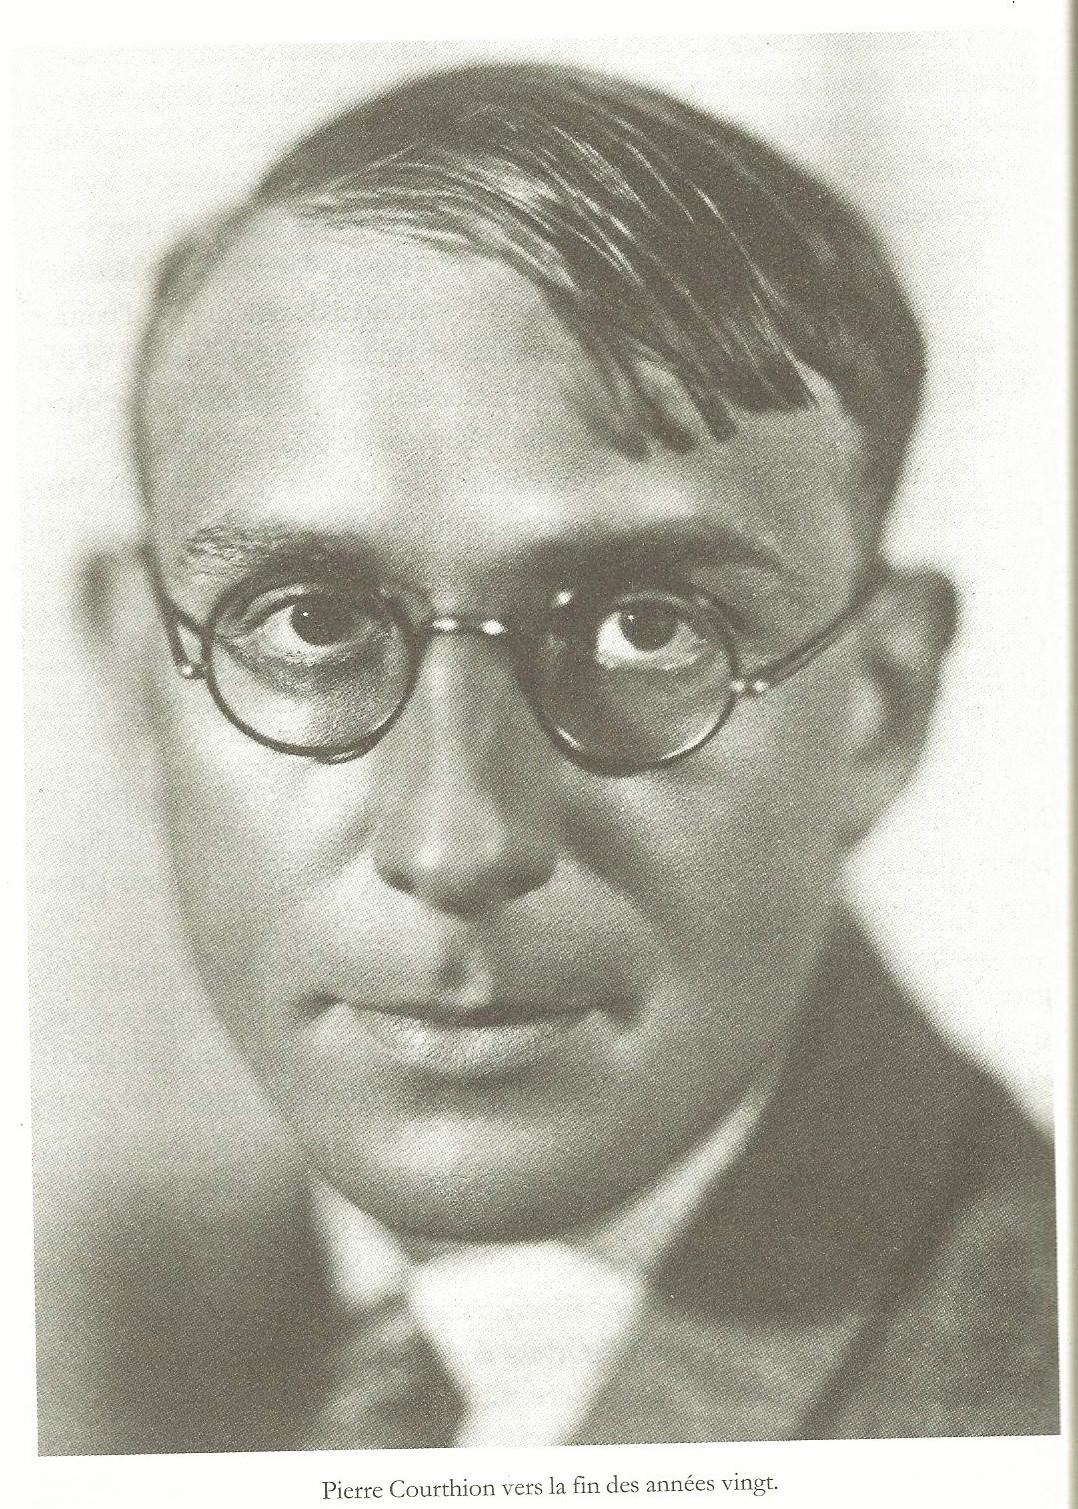 Pierre Courthion